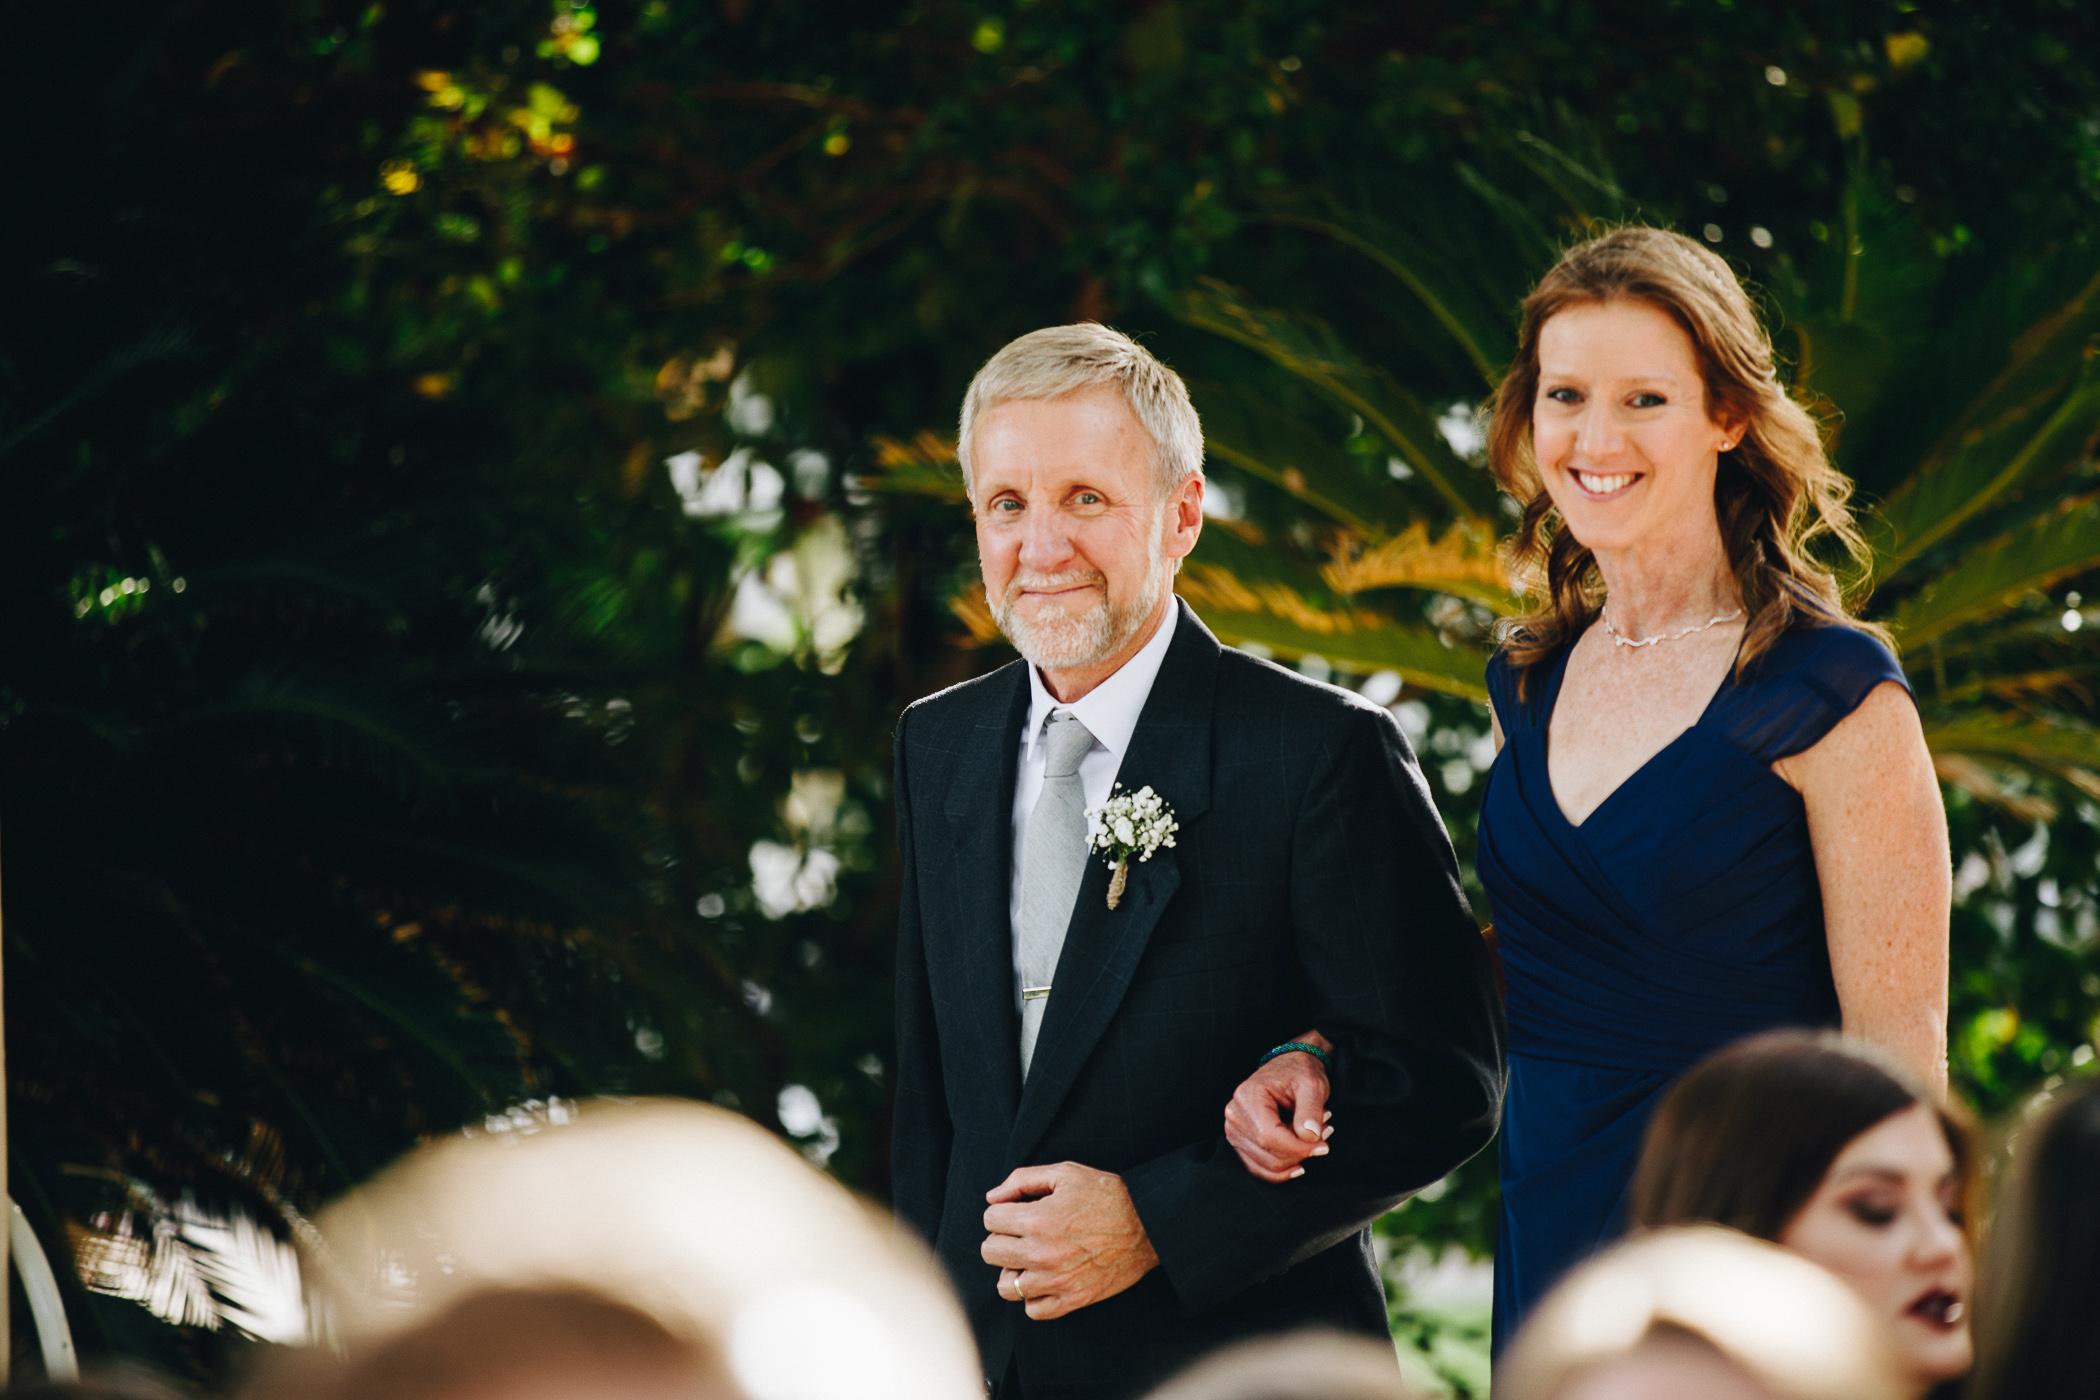 181104-Luxium-Weddings-Arizona-@matt__Le-Brandon-Kariana-Phoenix-Valley-Garden-Center-1054.jpg